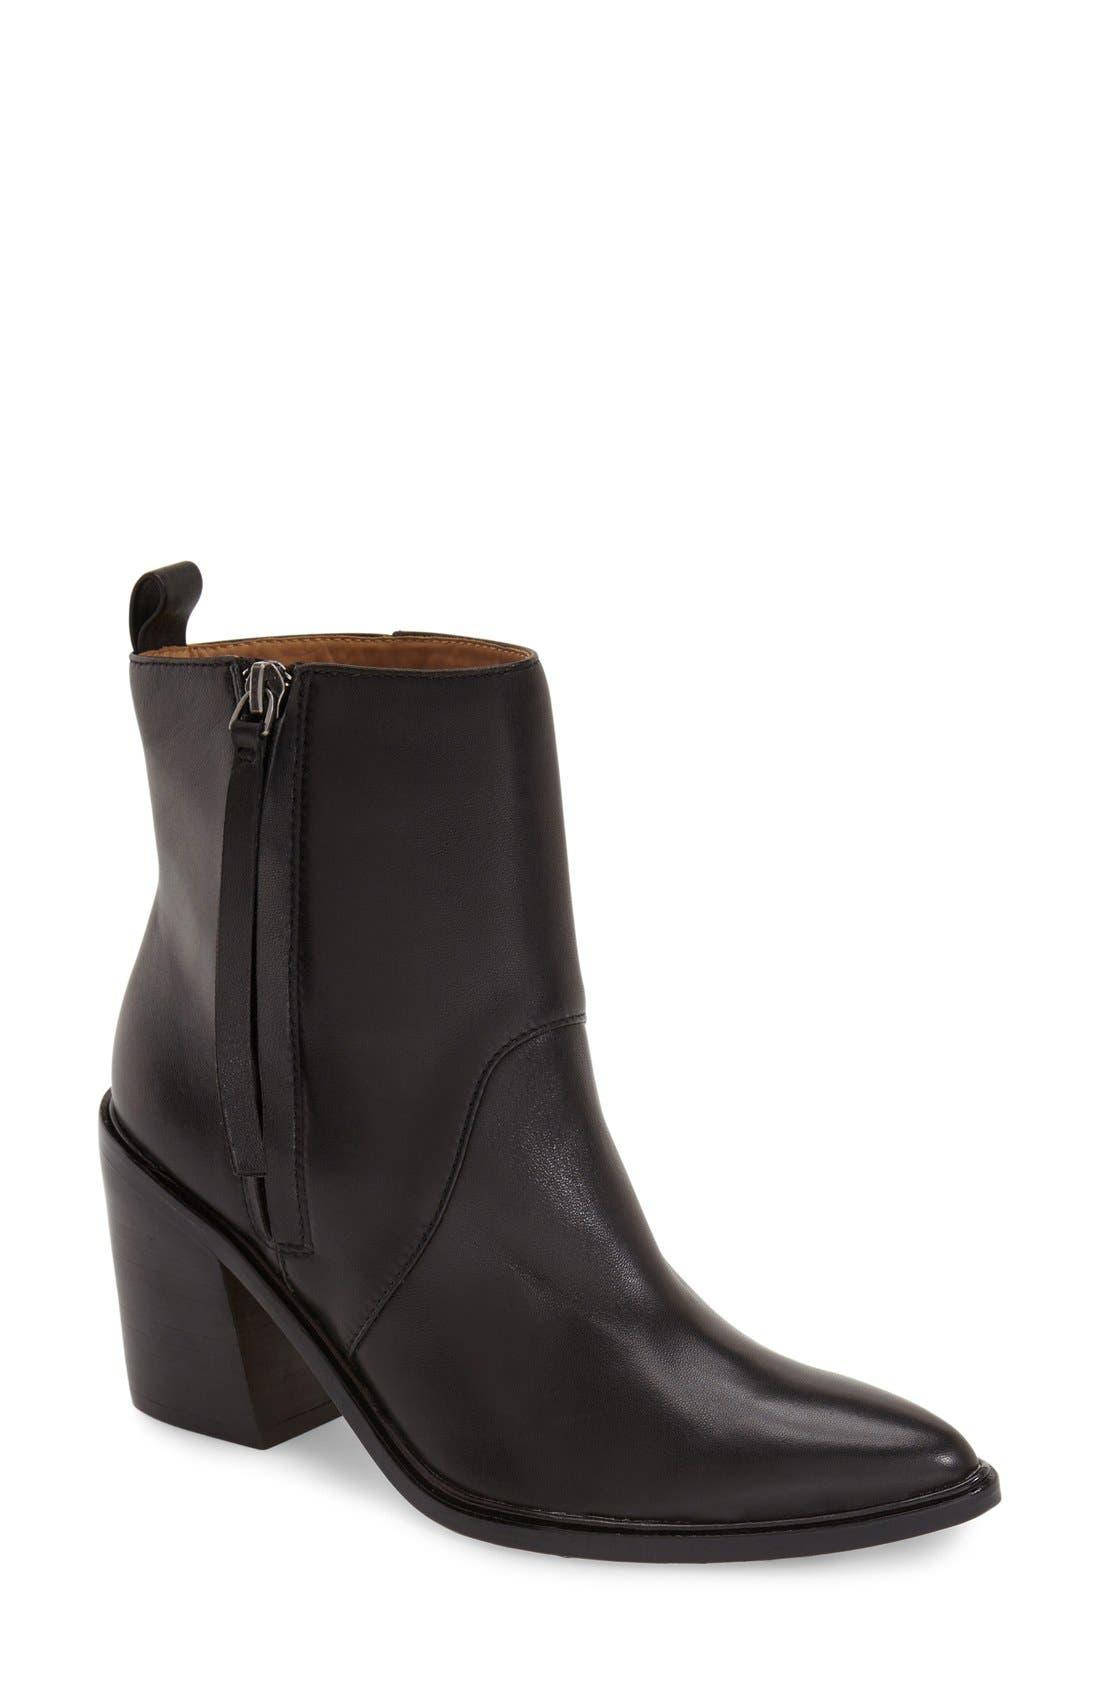 Alternate Image 1 Selected - Bettye Muller 'Troy' Pointy Toe Boot (Women)